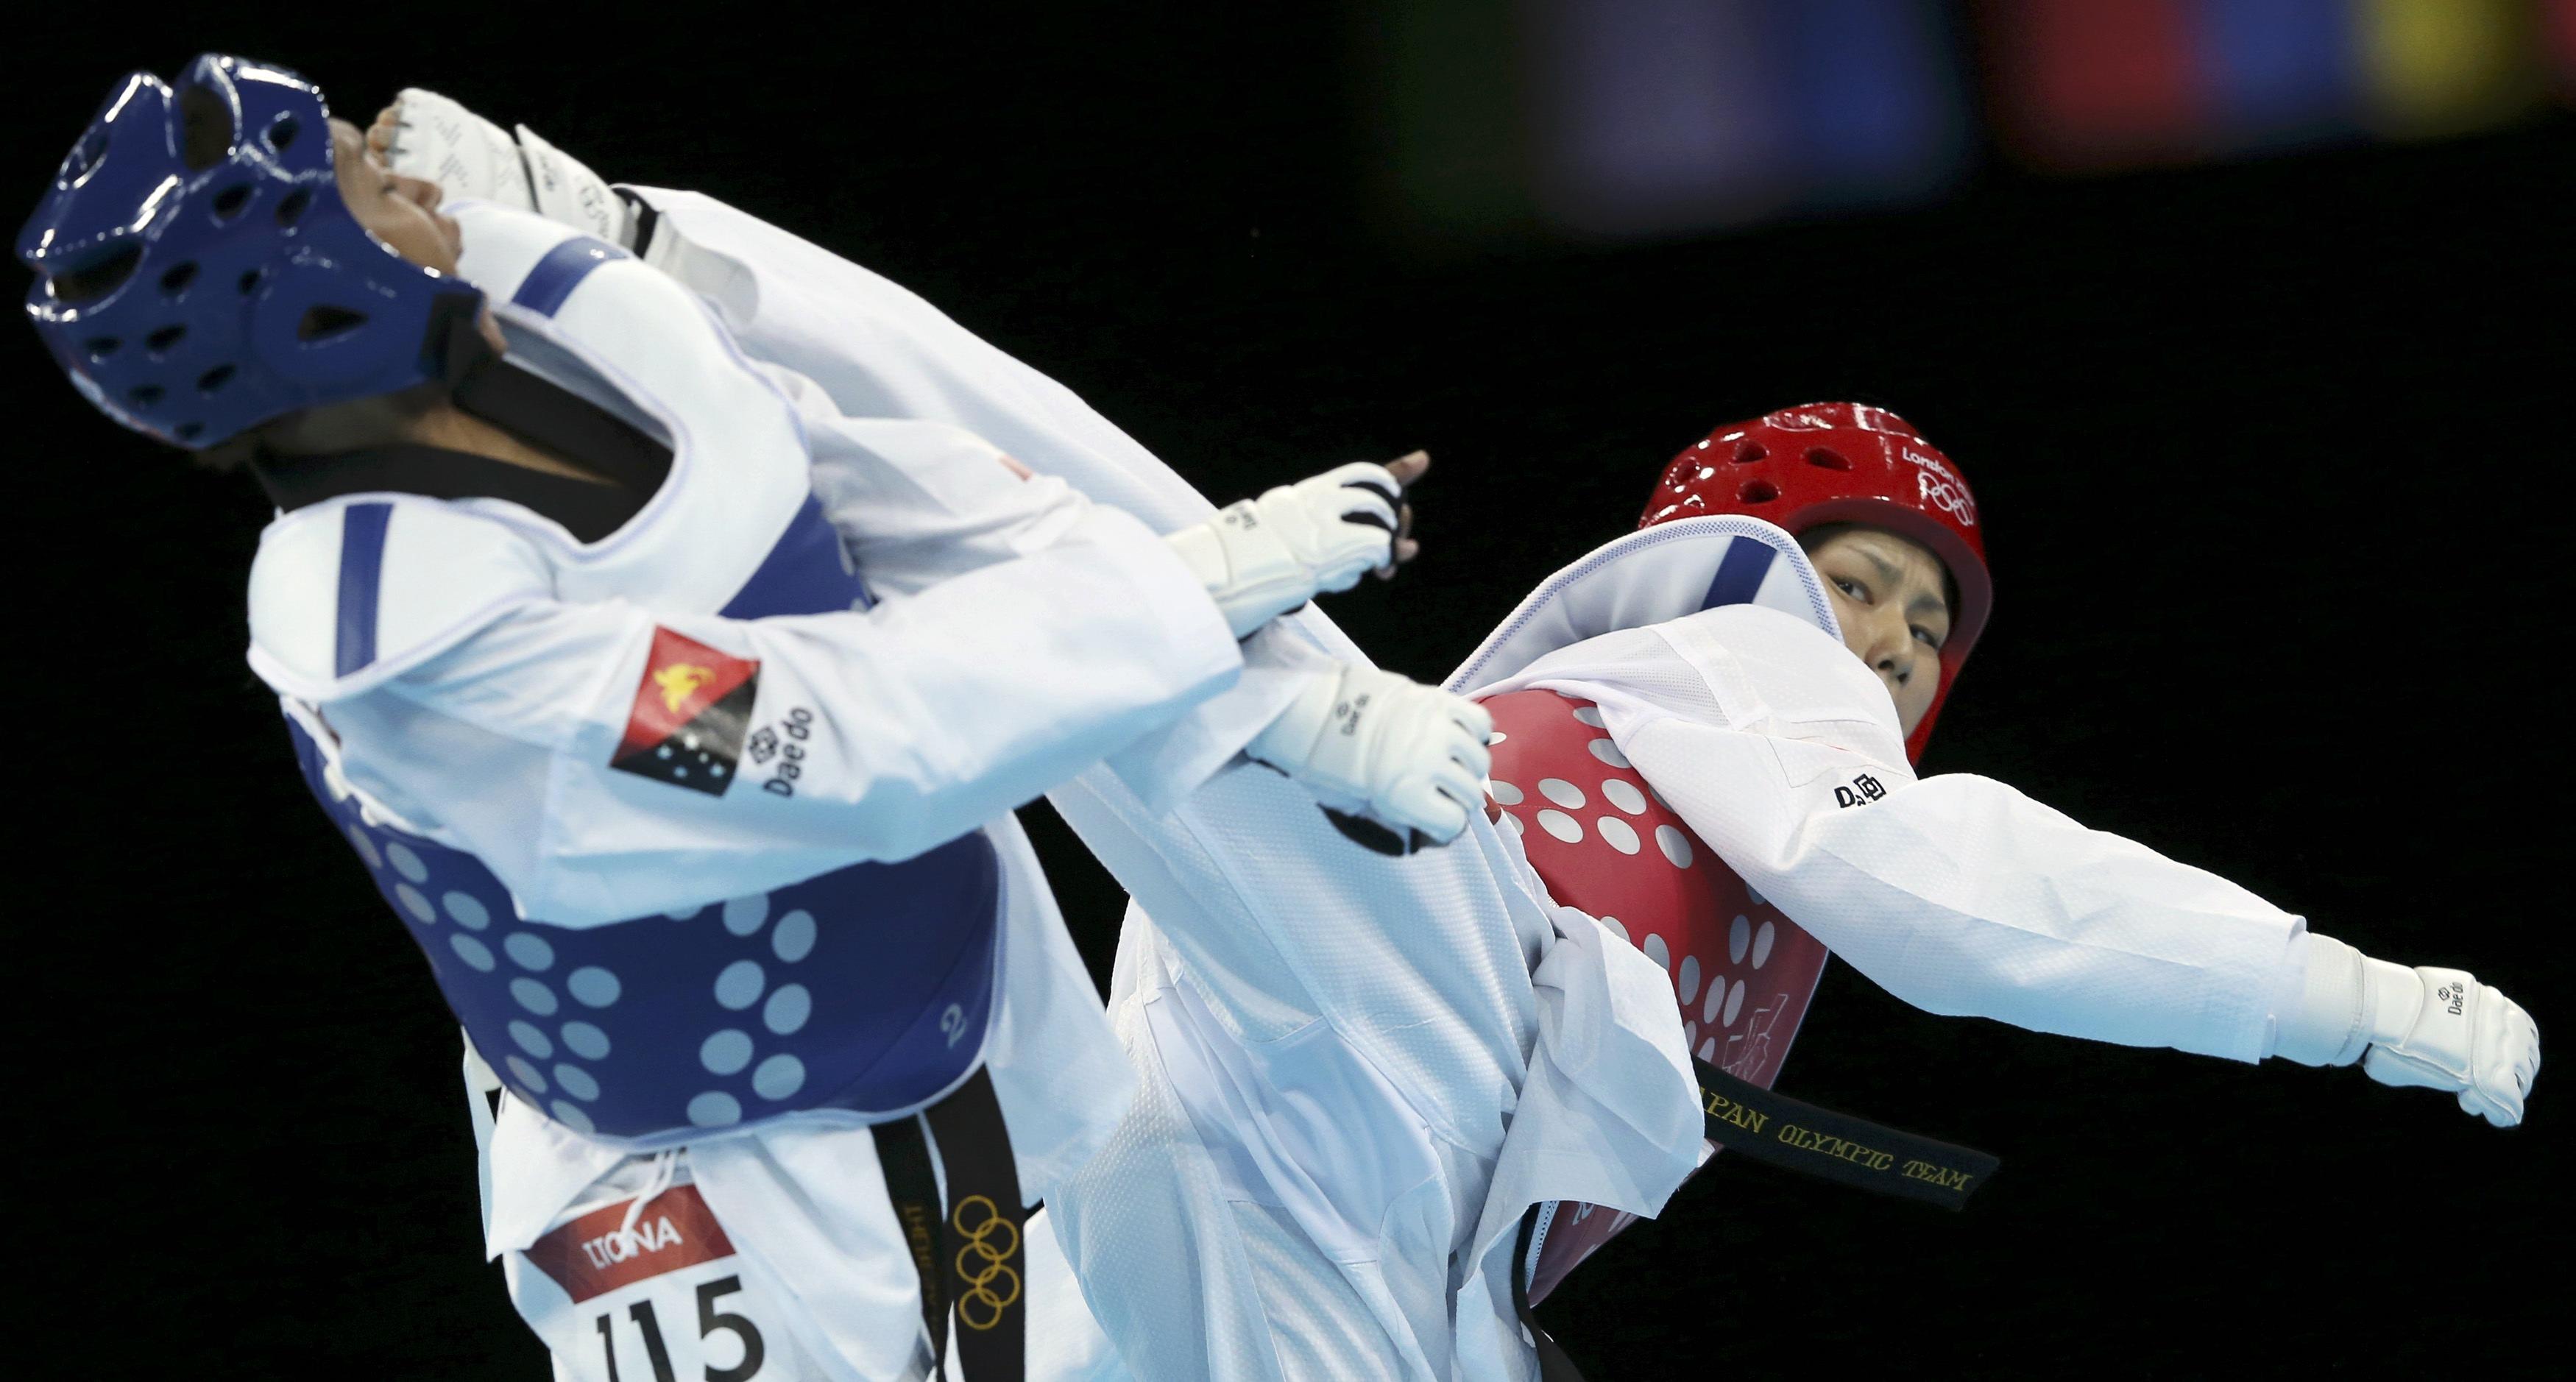 Dos jugadoras de taekwondo